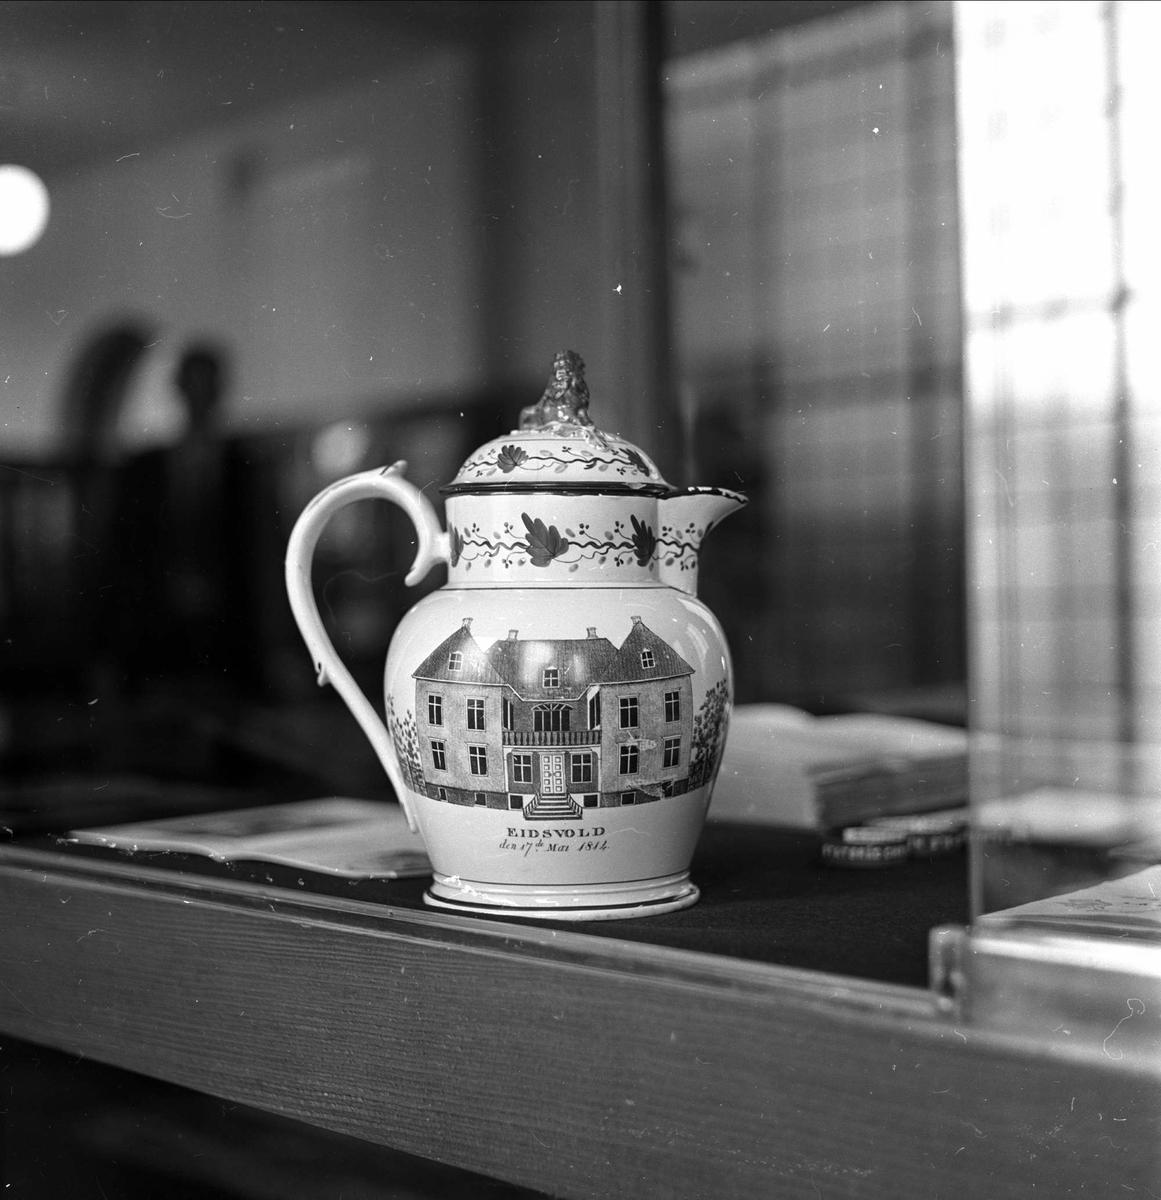 Grunnlovsjubileet, Eidsvoll, 18.04.1964, mugge m/bilde av Eidsvollsbygningen,